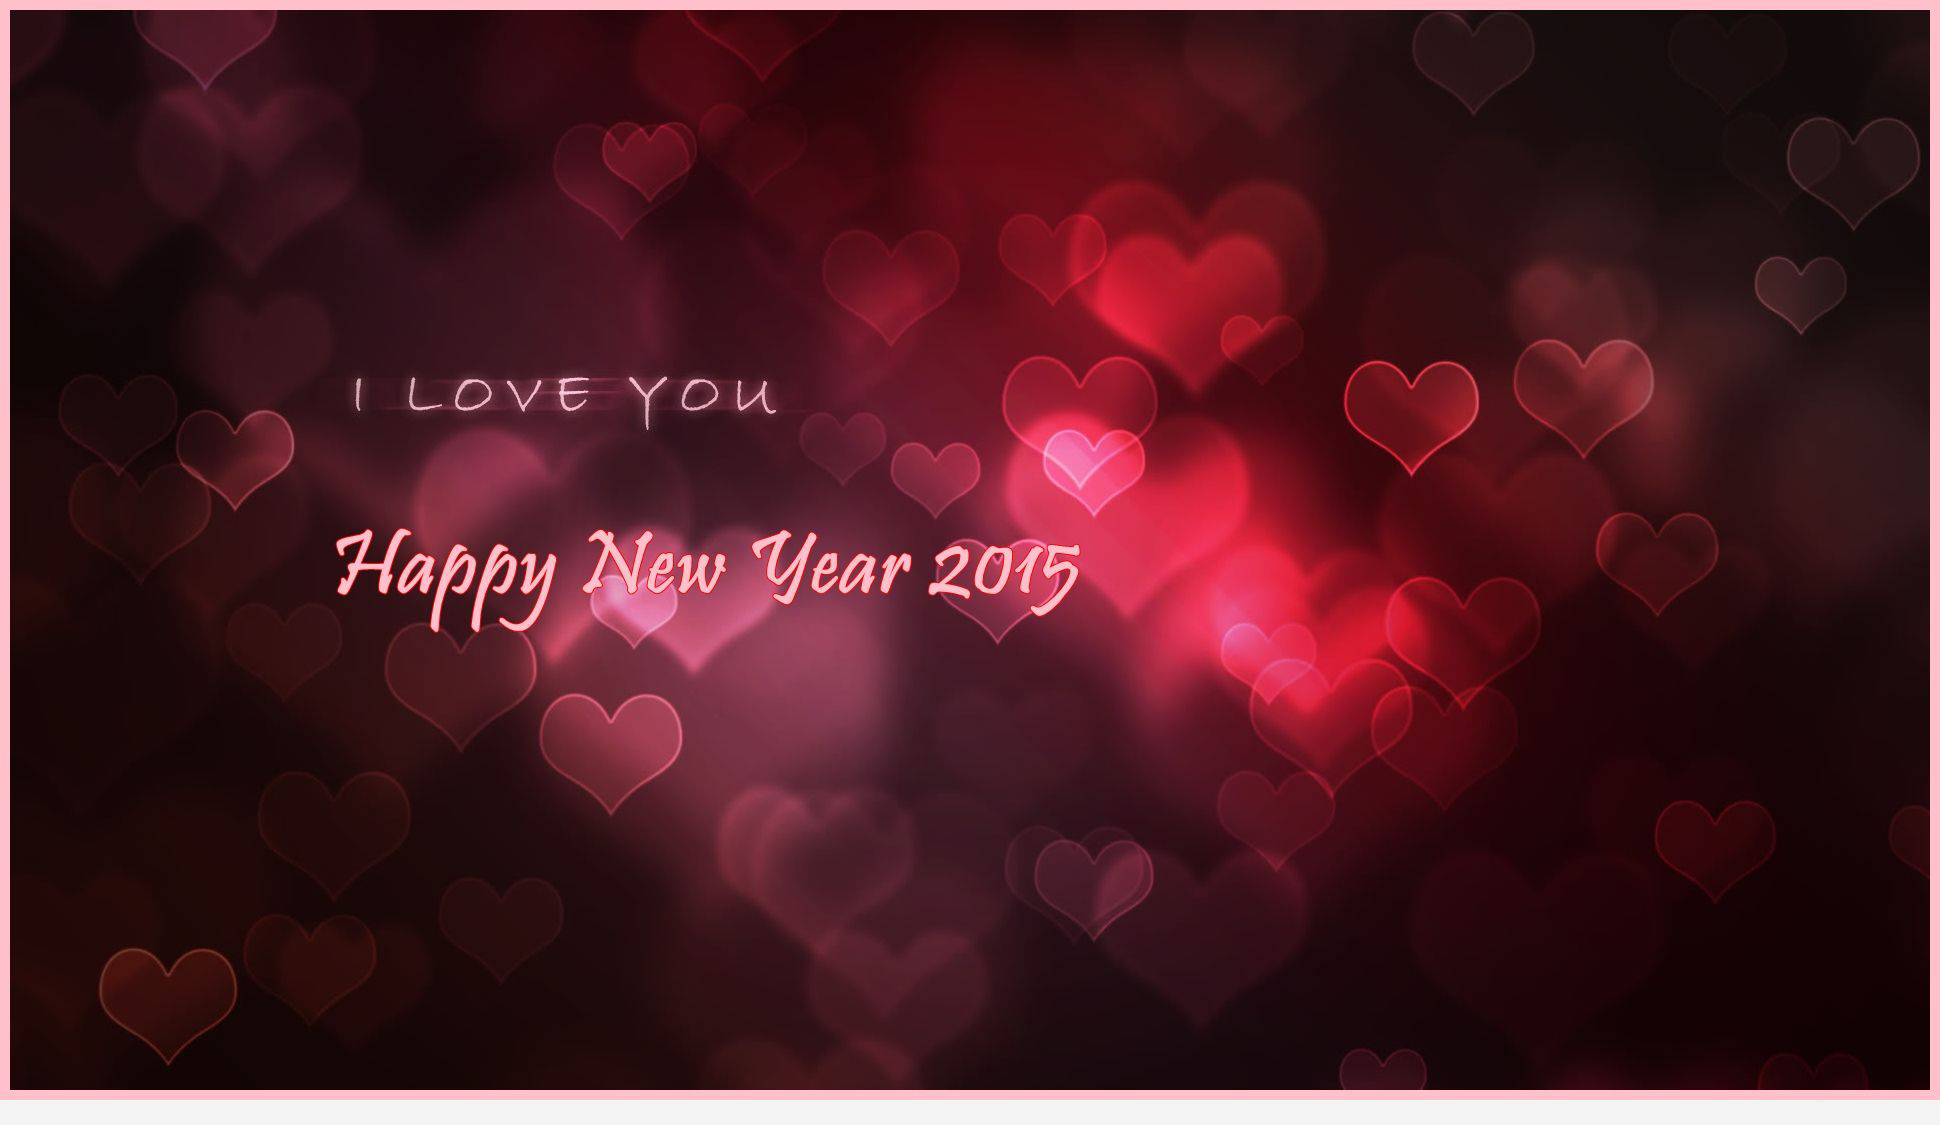 Wallpaper download new love - The Inscription I Love You 2015 Wallpapers And Images Wallpapers